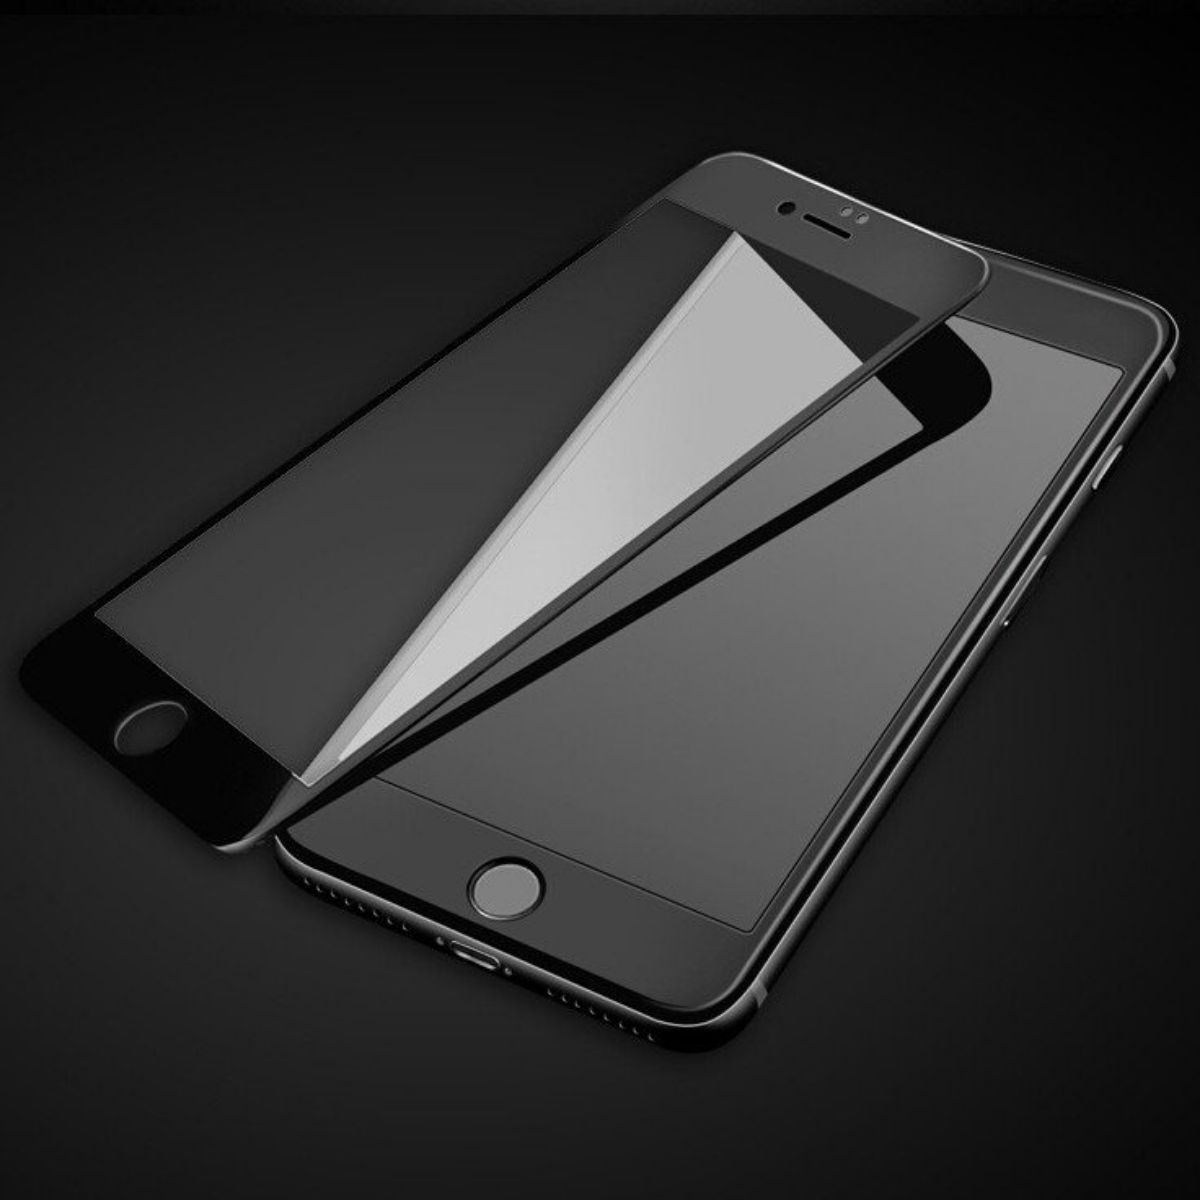 Otterbox представлена уникальная защитная пленка для iPhone